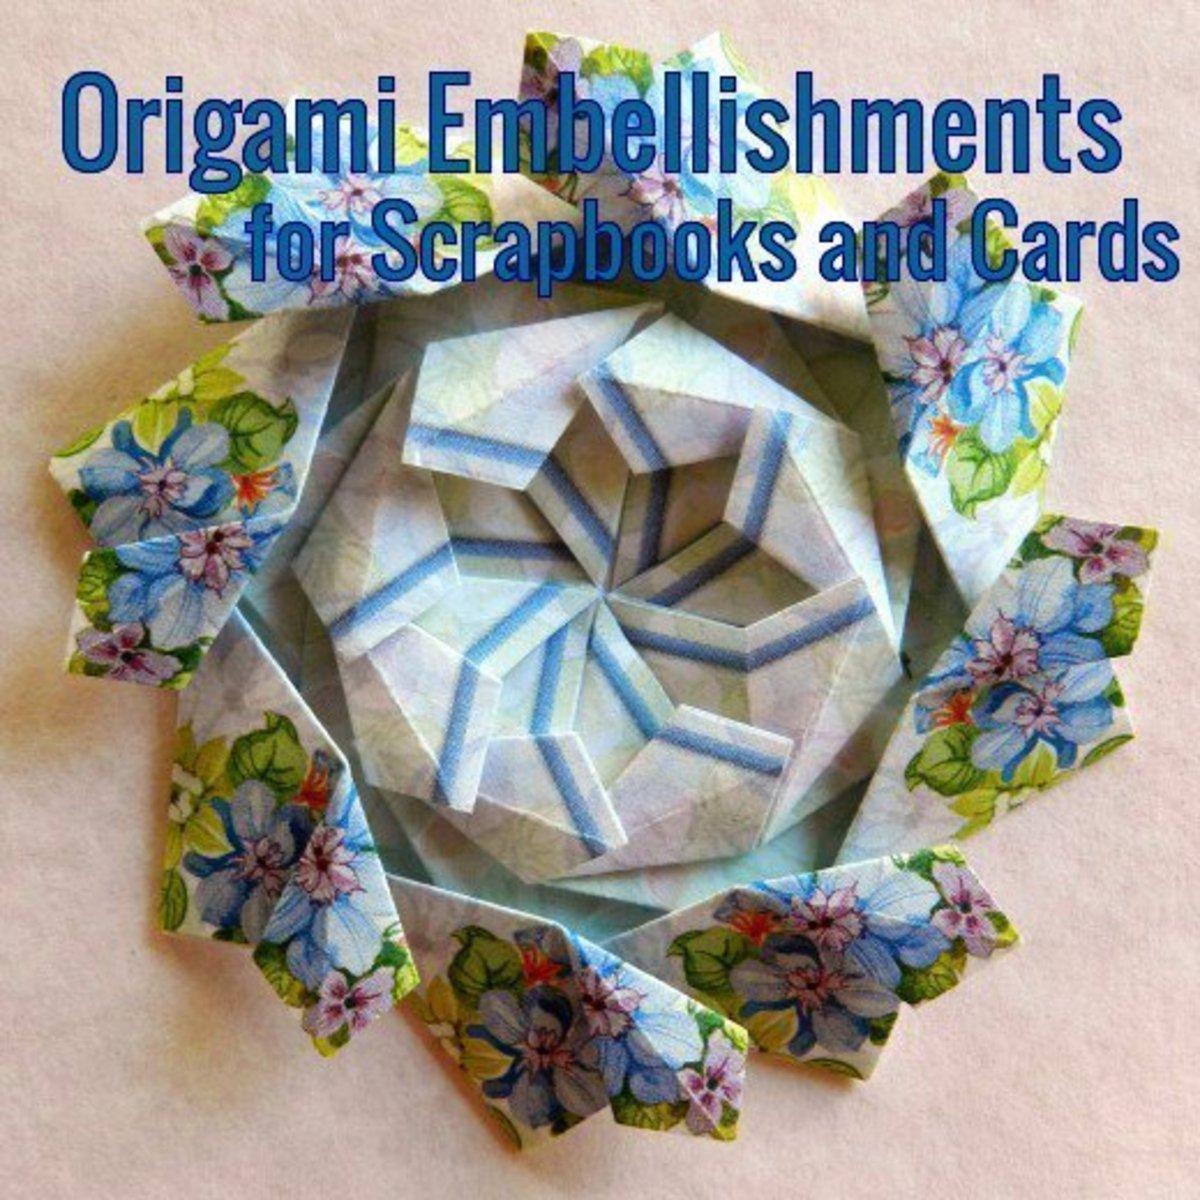 Origami Embellishments